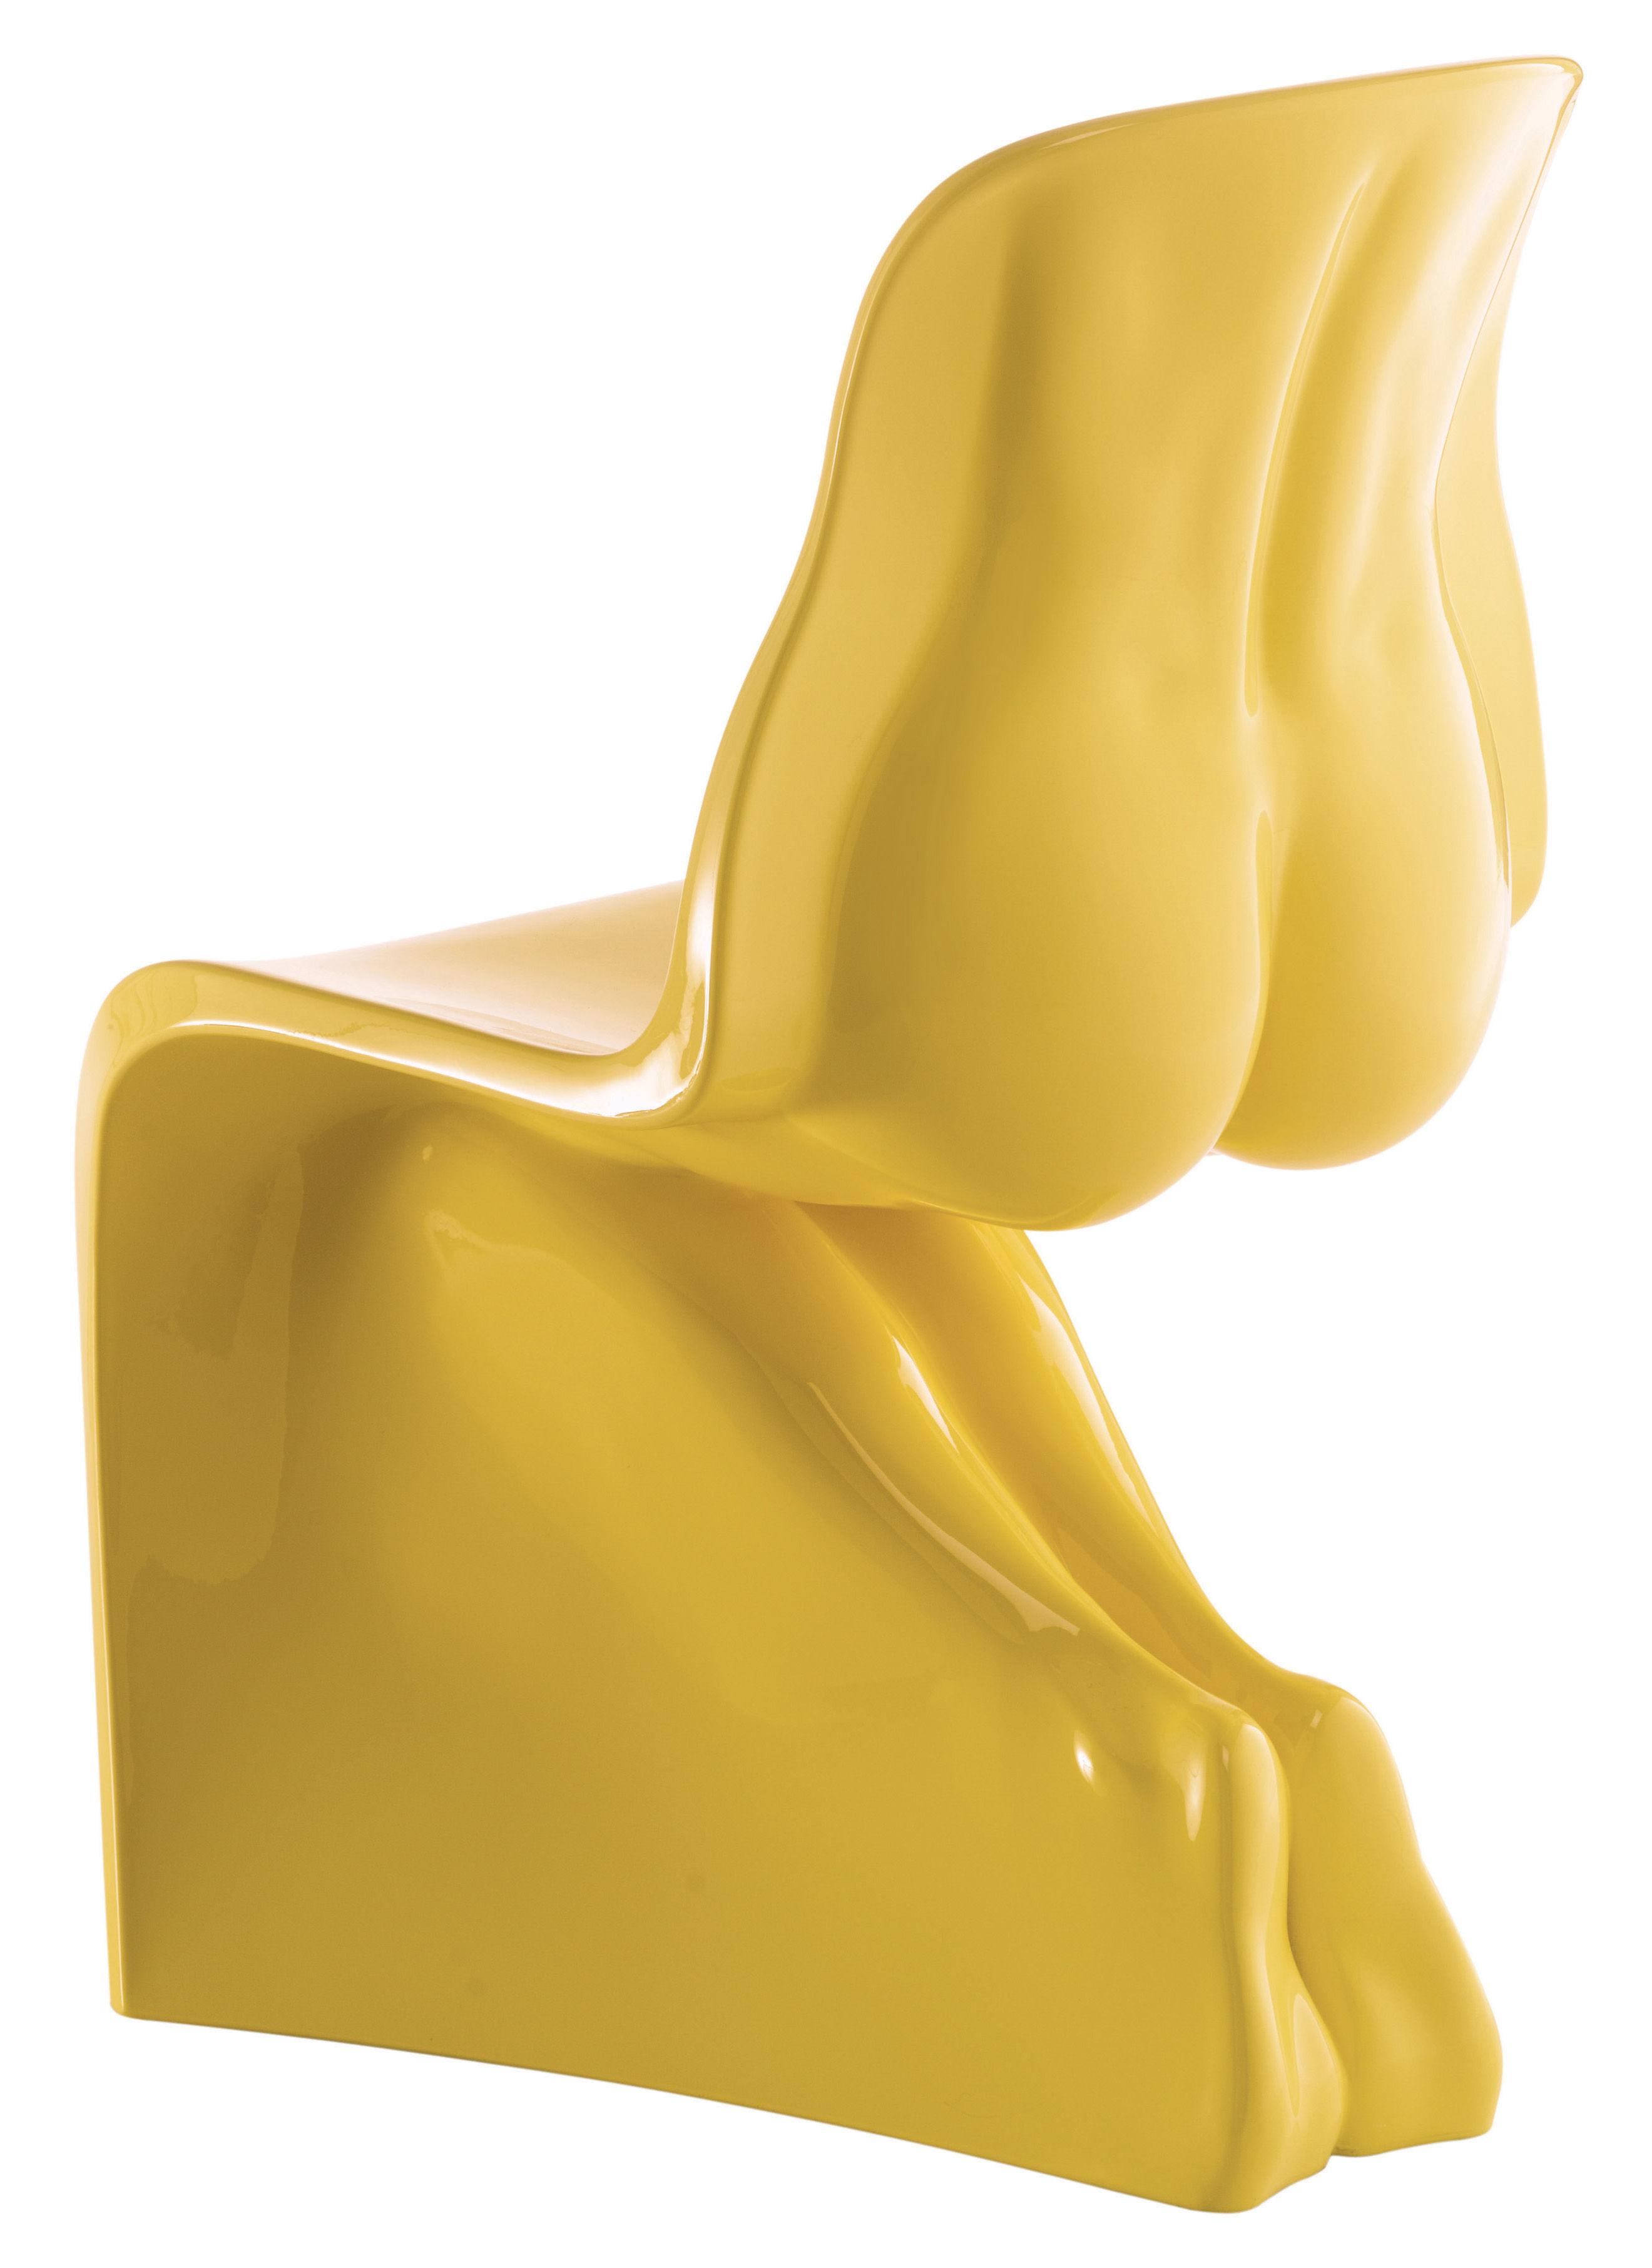 Möbel - Stühle  - Her Stuhl lackiert - Casamania - Gelb - Polyäthylen